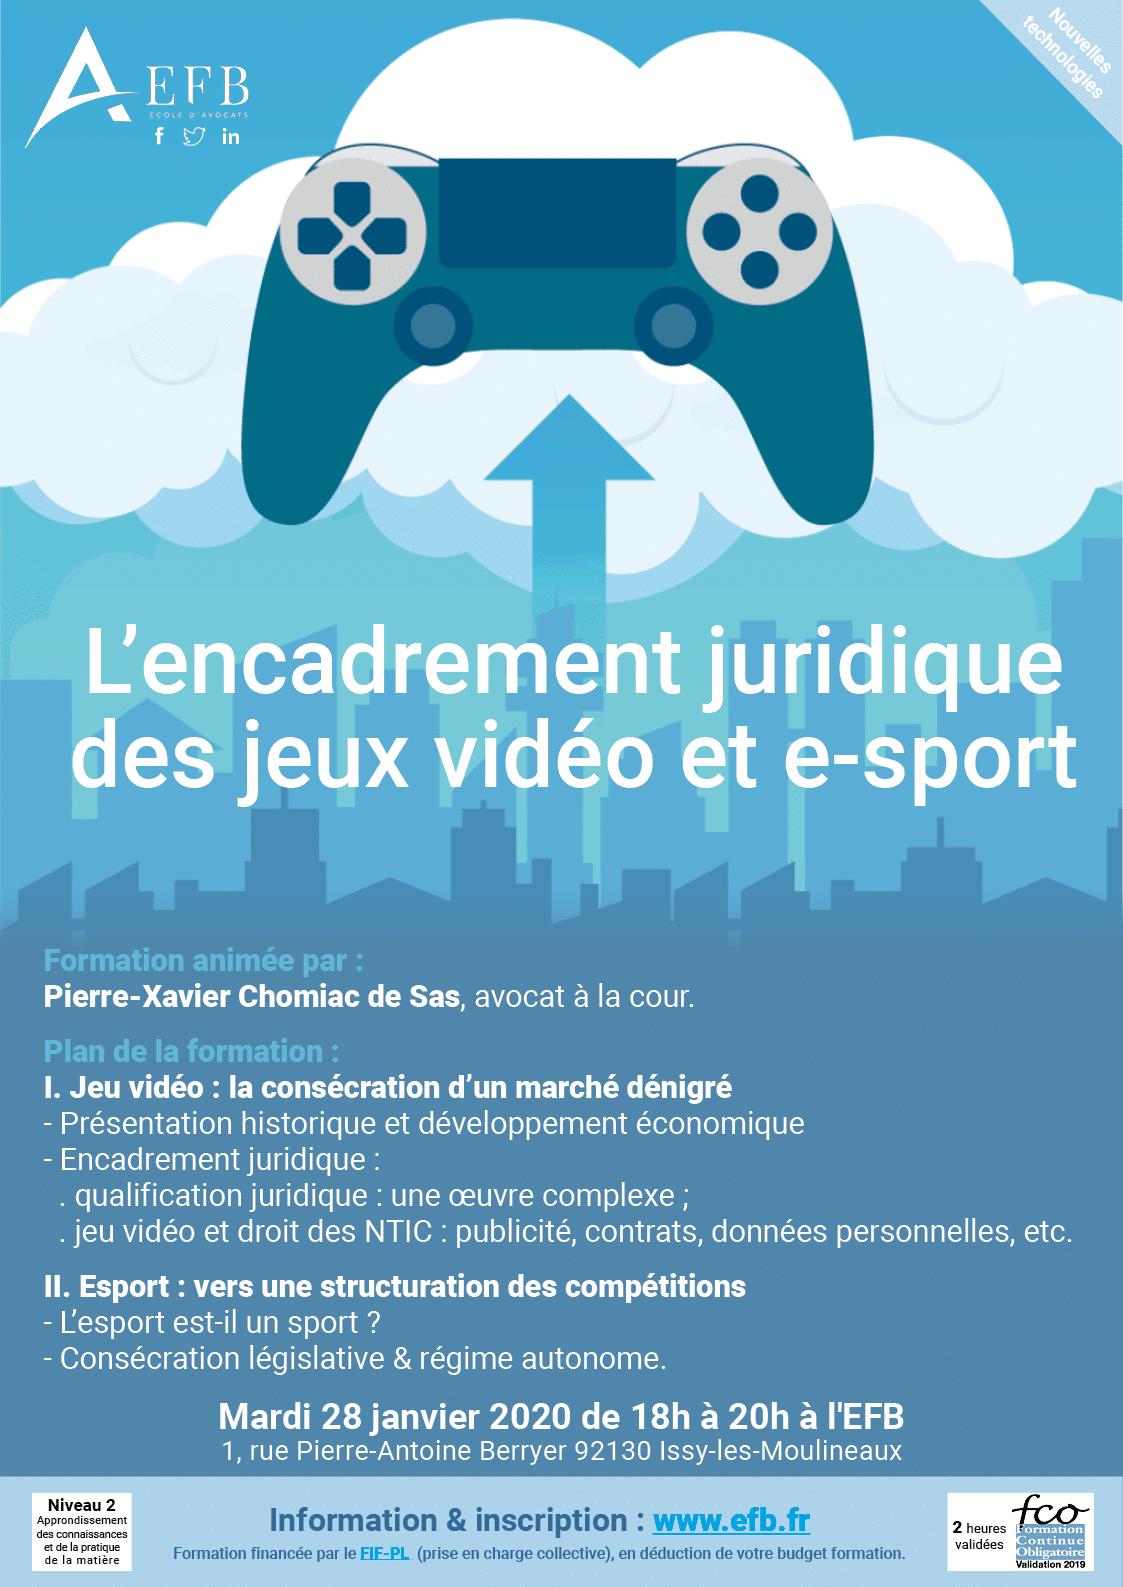 EFB Avocats - Droit de l'esport et des jeux vidéo - PCS Avocat - Loi et contrats esportifs